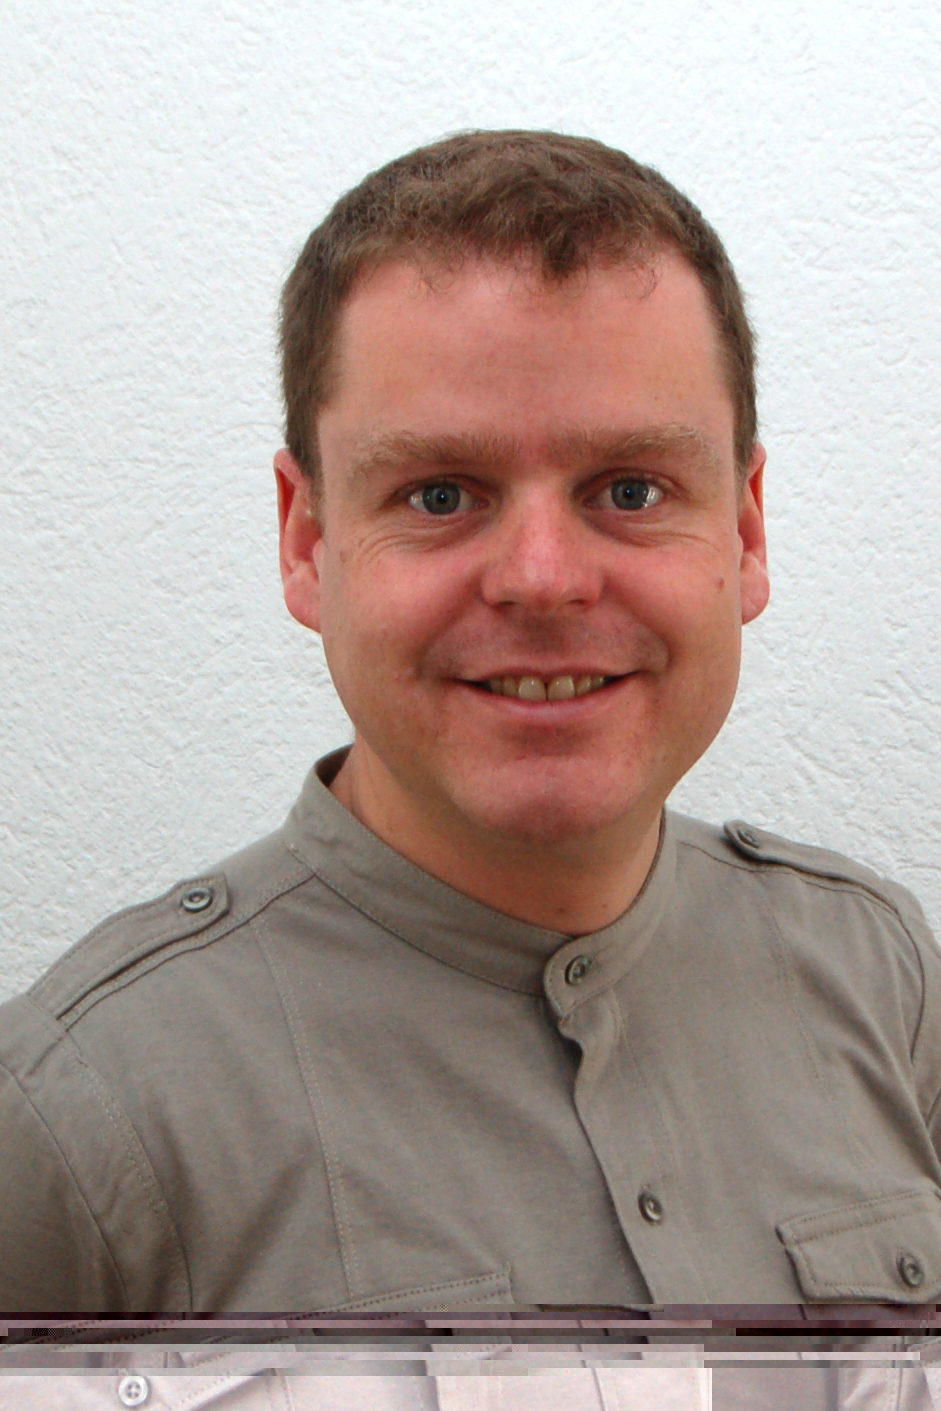 Christian Neff